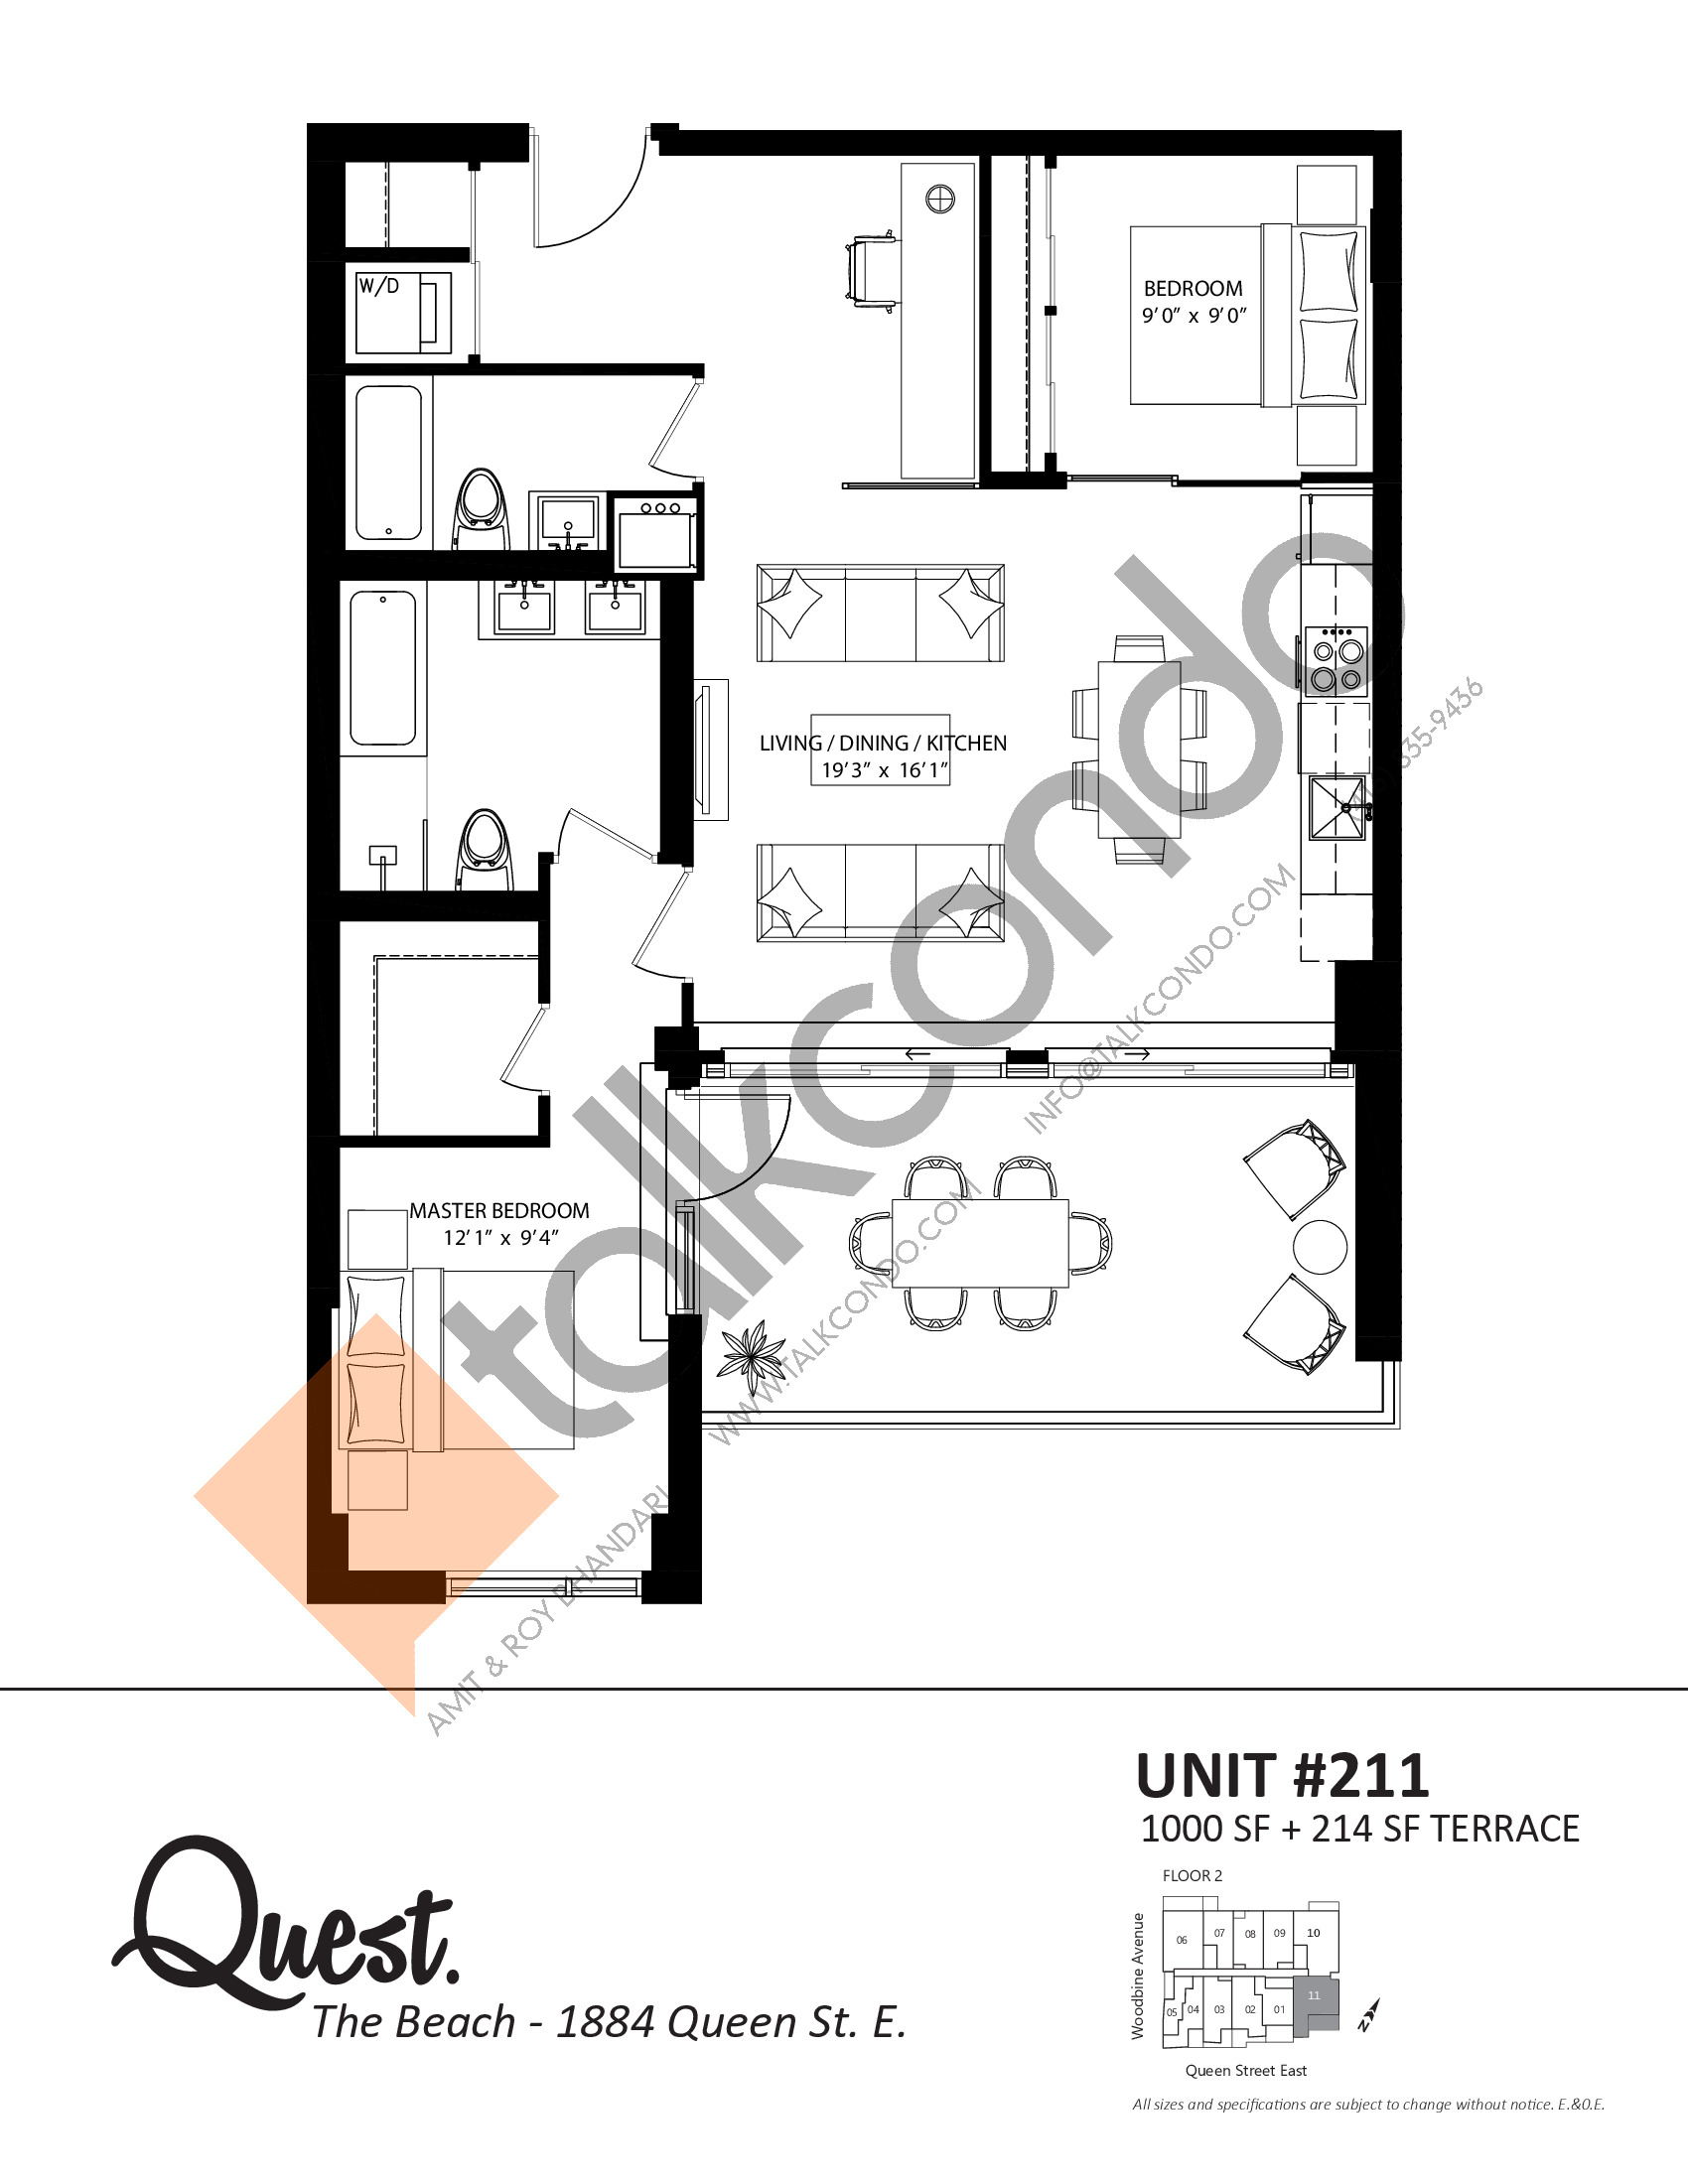 Unit 211 Floor Plan at Heartwood the Beach Condos - 1000 sq.ft